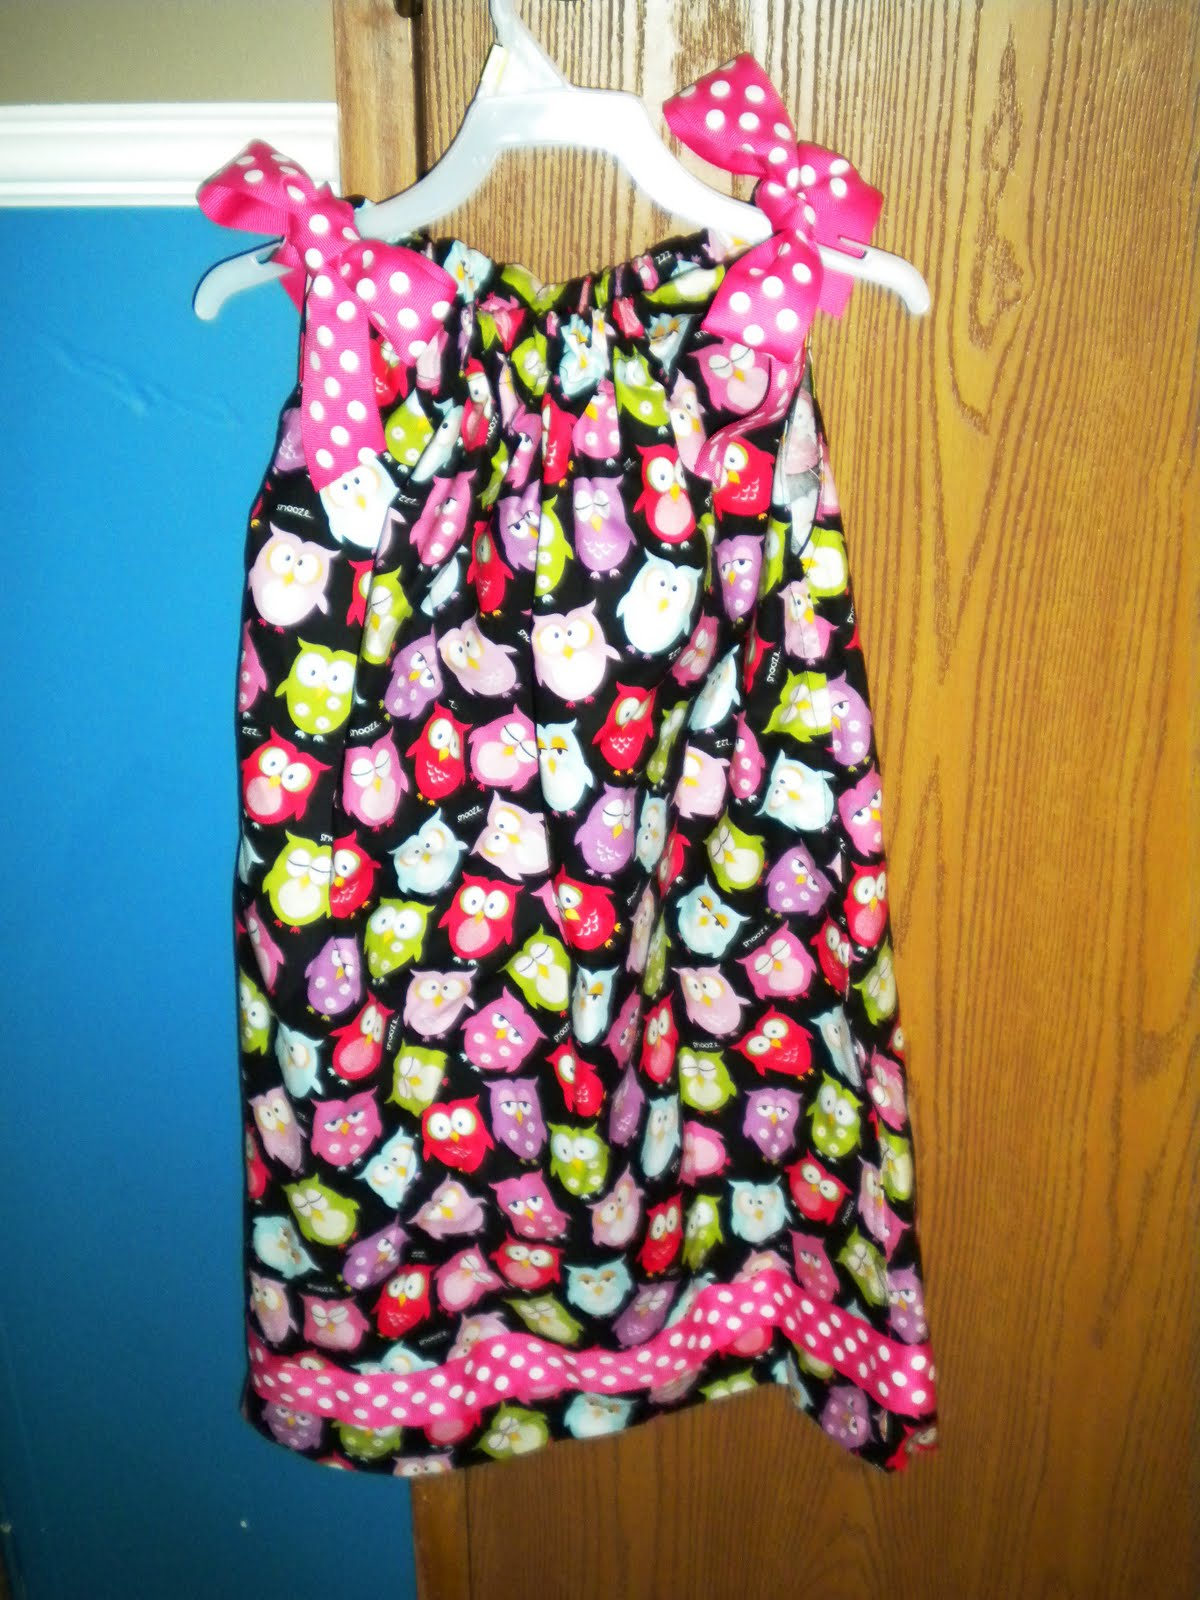 Pillowcase Dress Pattern Hobby Lobby: Scrapcation Getaway  Owl Fabric  a Pillowcase dress & a freebie!,